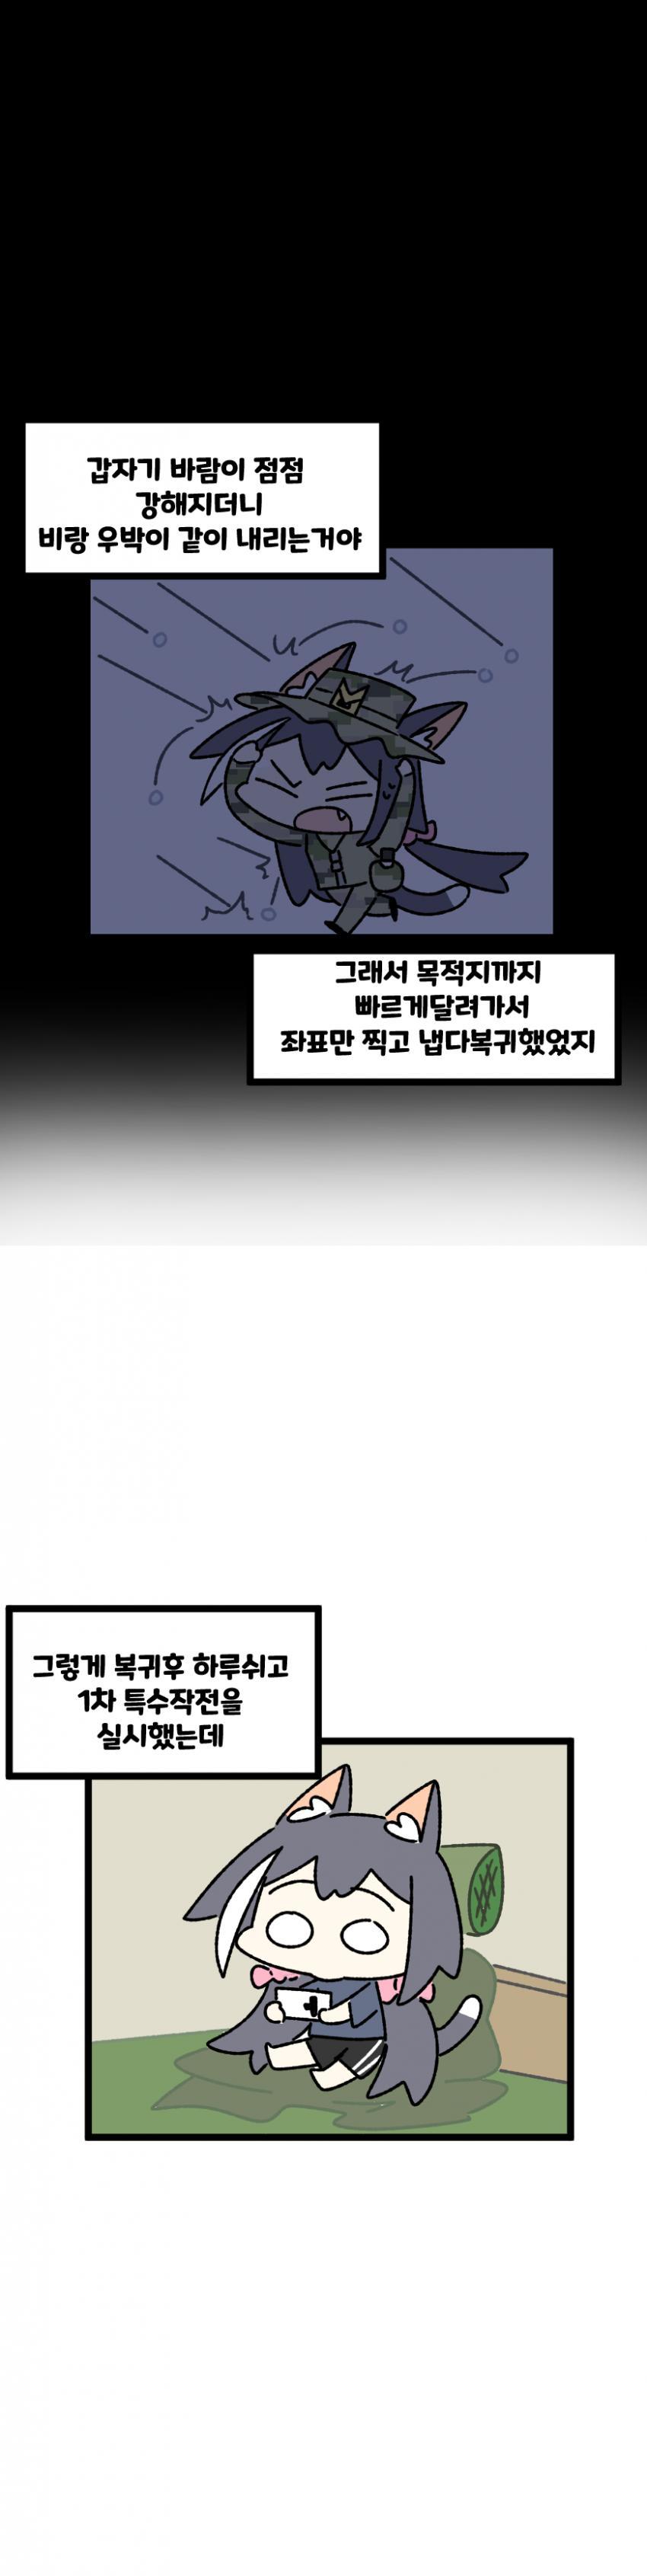 viewimage.php?id=2ebcc232eadd36&no=24b0d769e1d32ca73fec8efa11d02831835273132ddd61d36cf617d09f43d54cff8b7278954ea96a93bf9ab3dcb07cadf07e8de445e902a2467d6a9e57ee3ce3fc